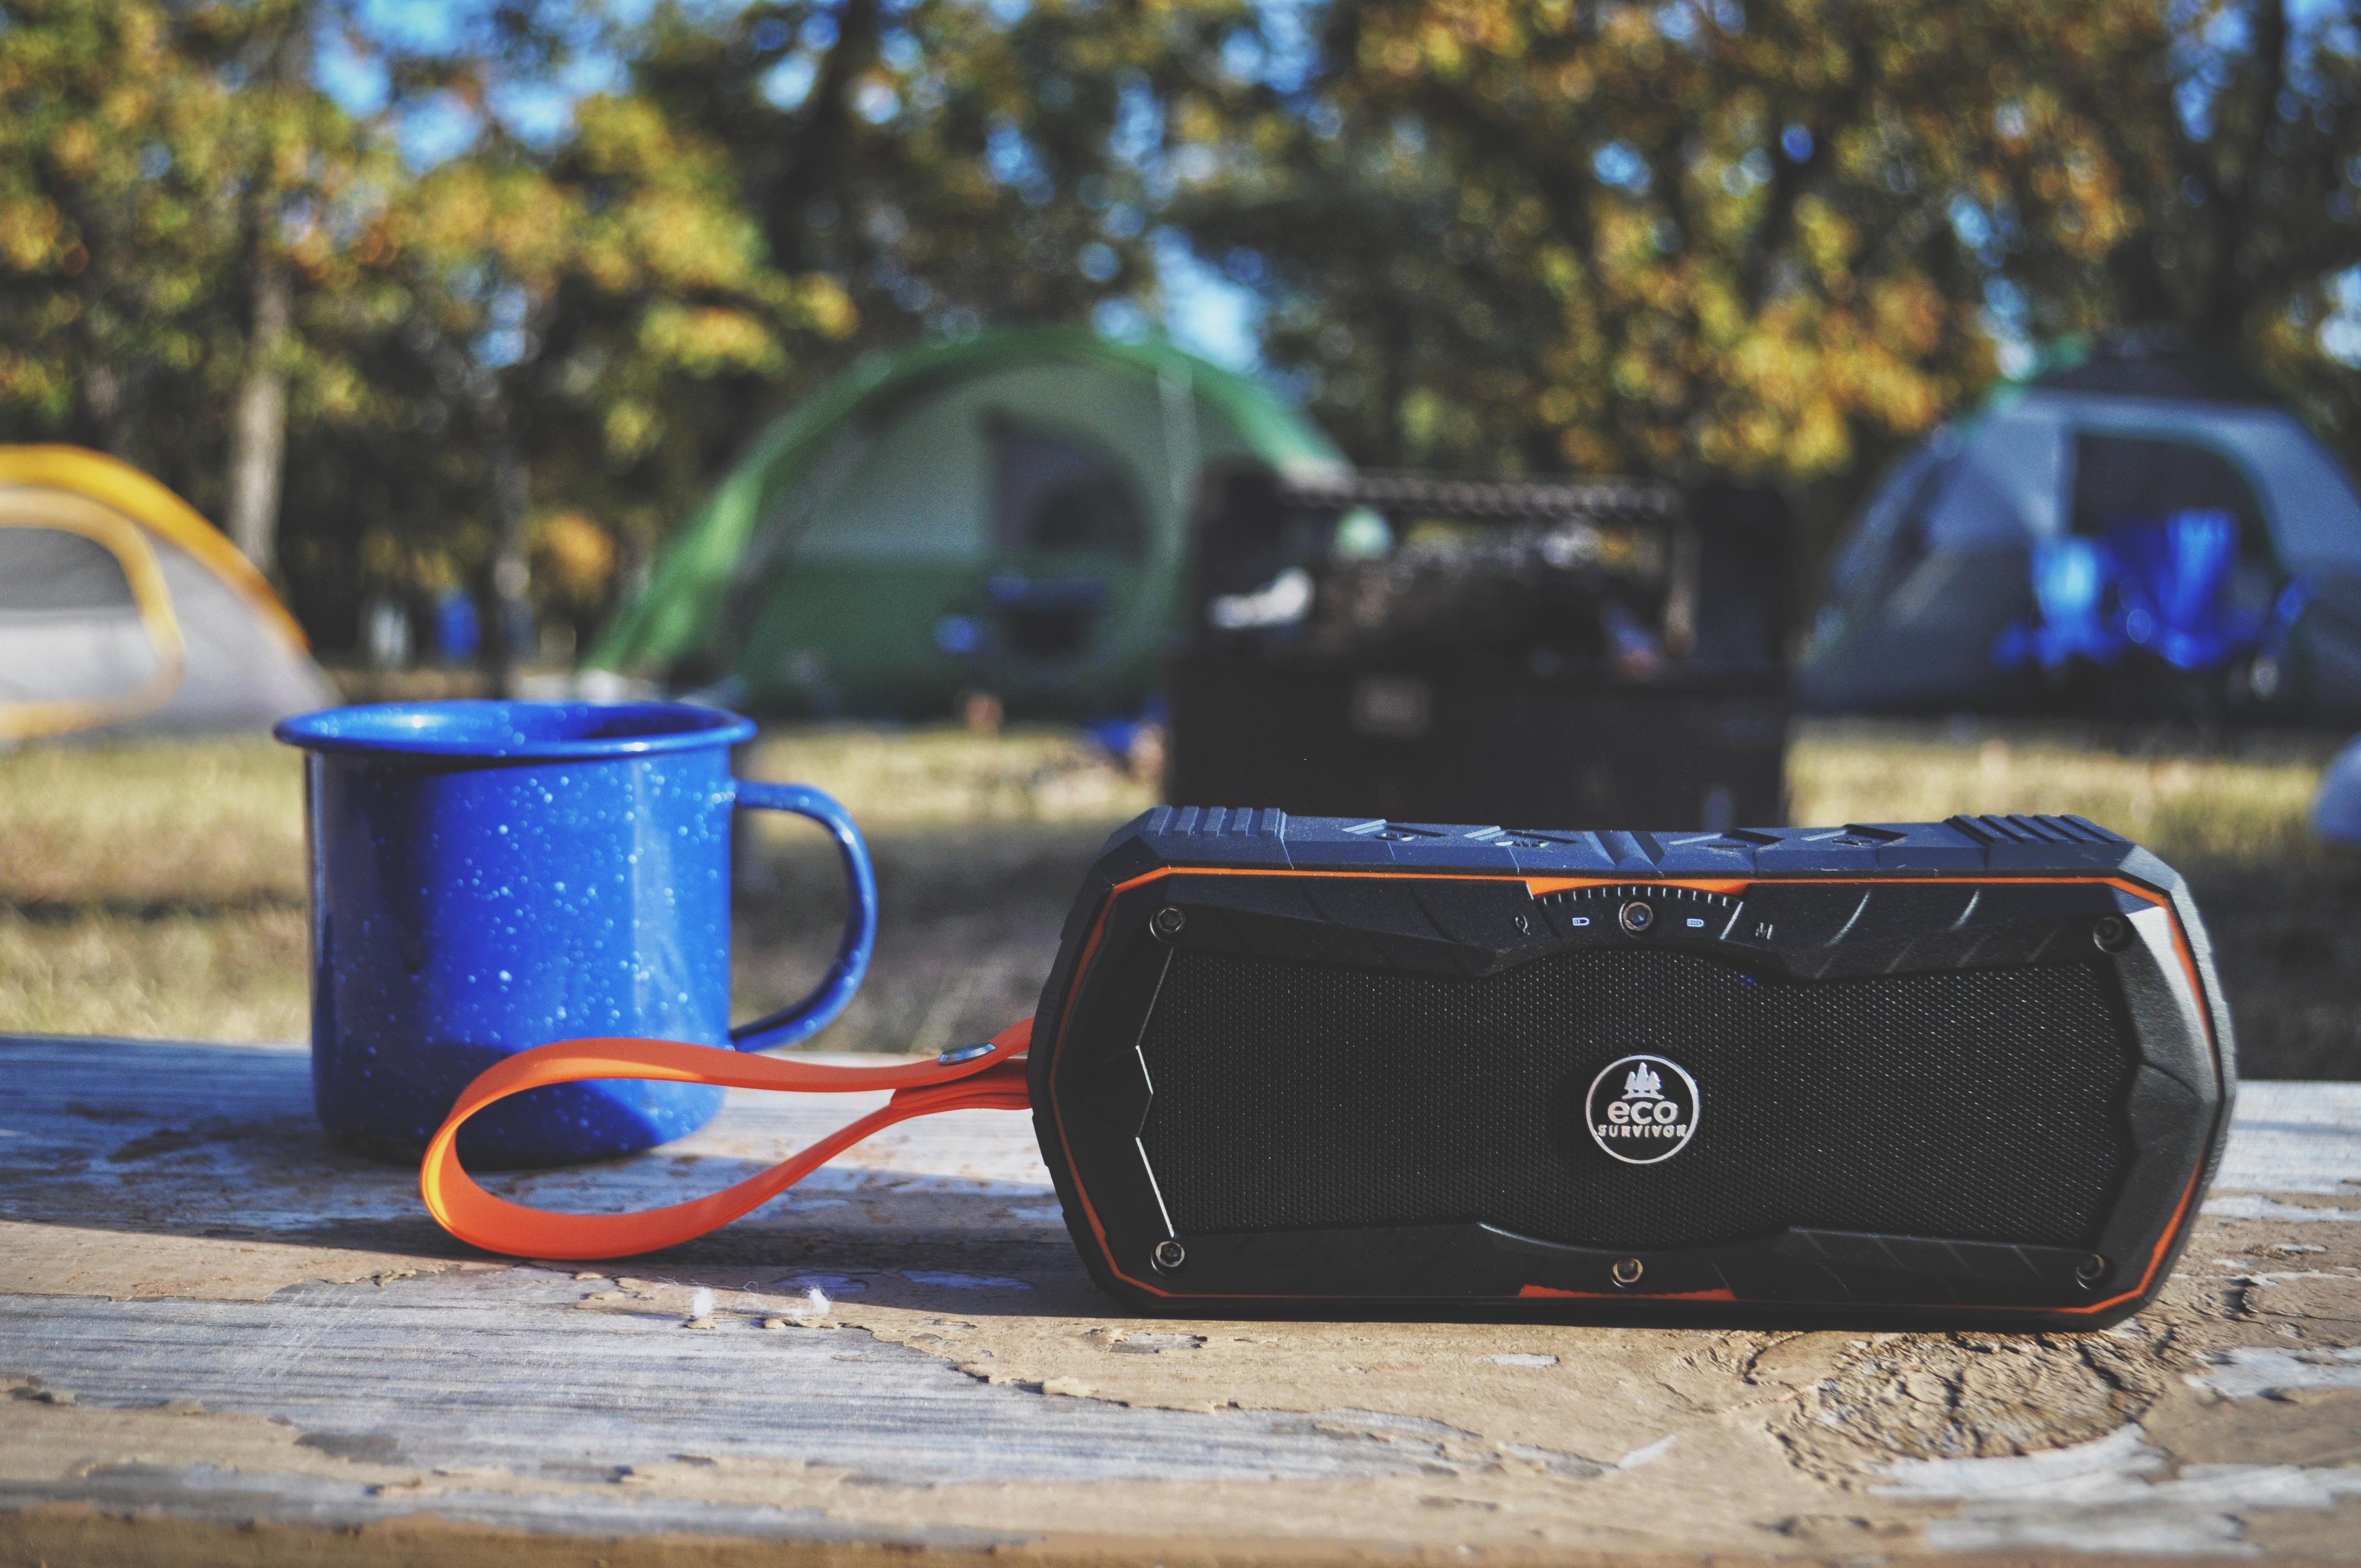 EcoSurvivor-battery-bluetooth-speaker-phone-charger-outdoor